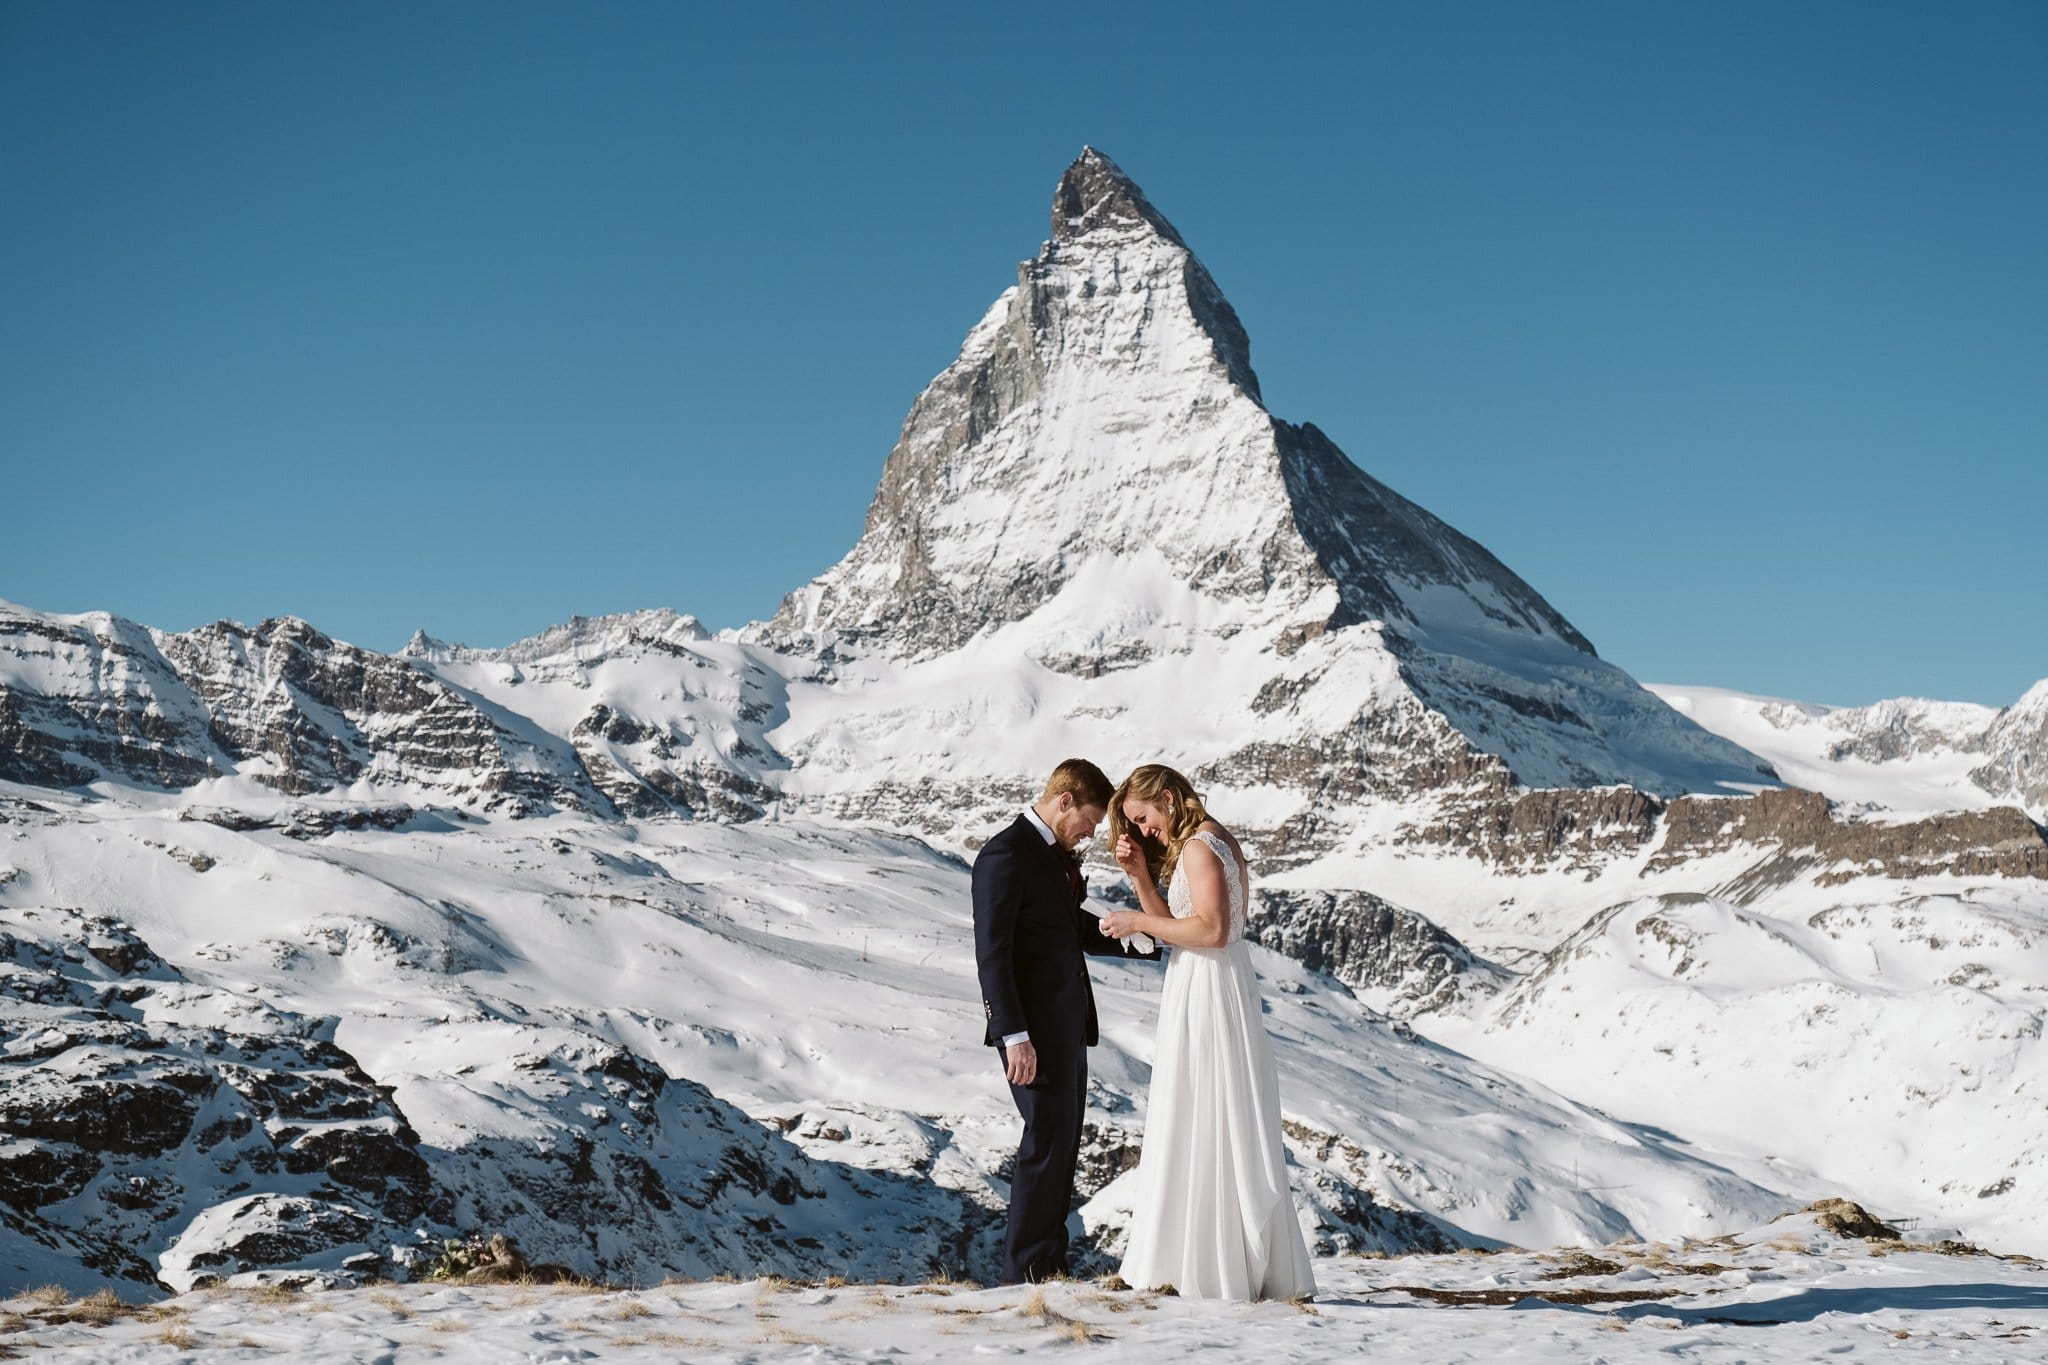 Matterhorn elopement in Zermatt, Switzerland